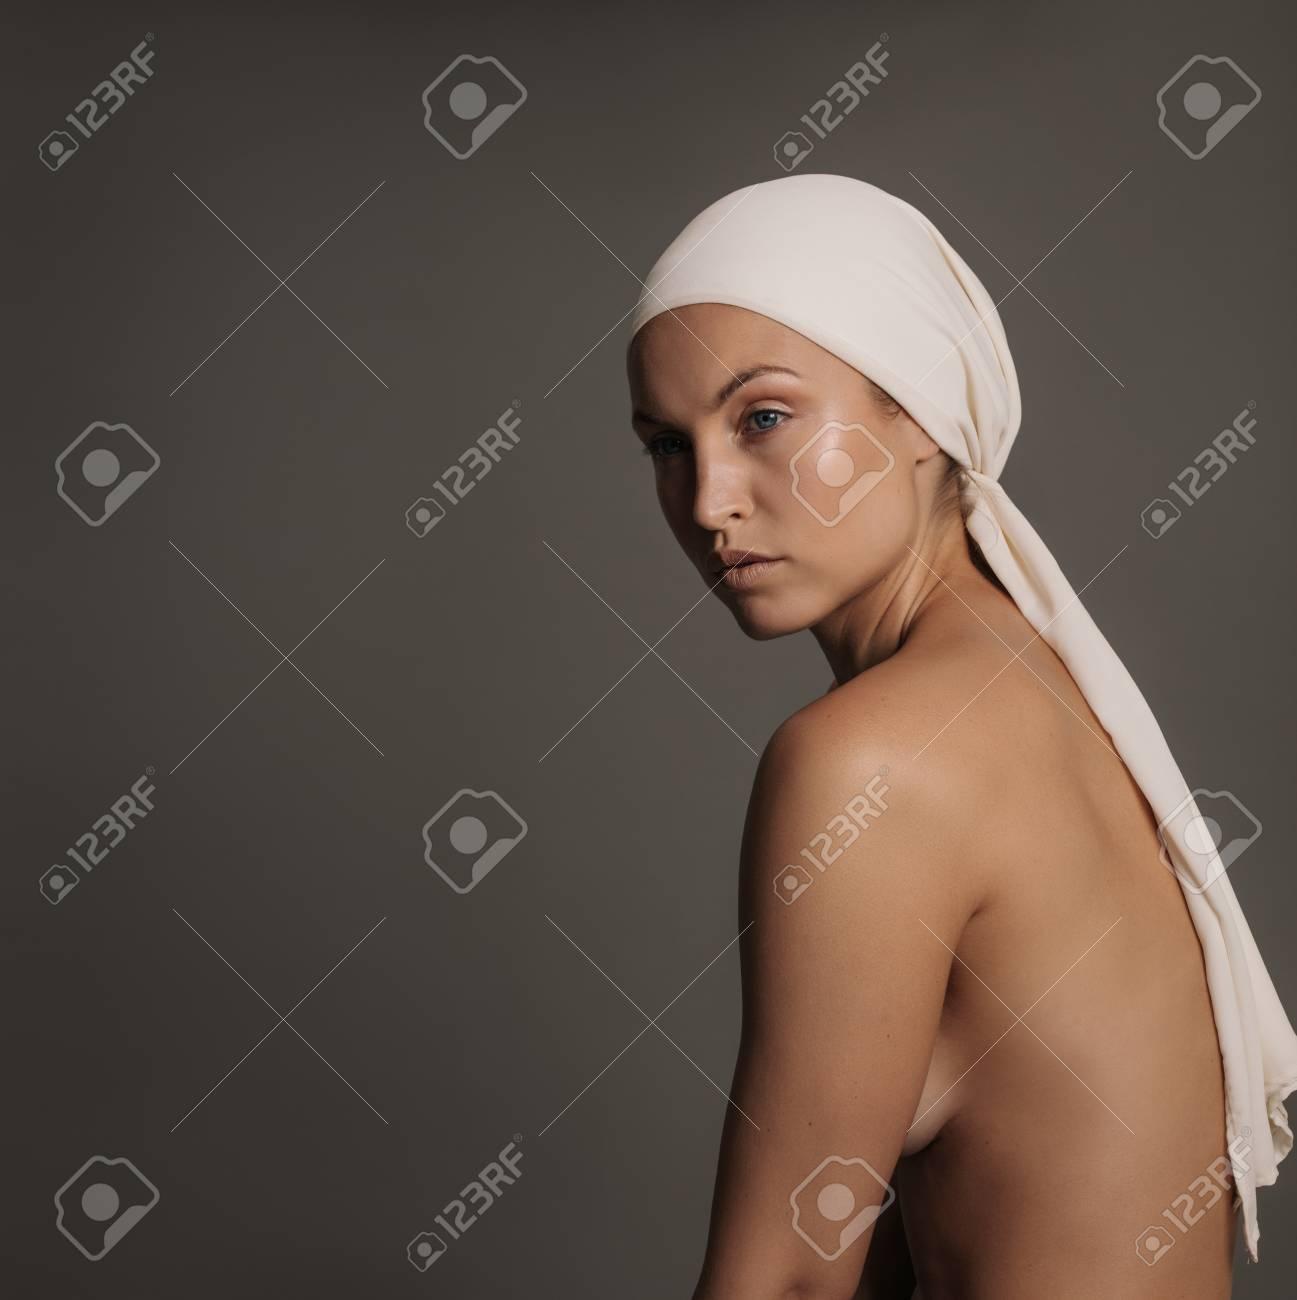 frau kopftuch nackt